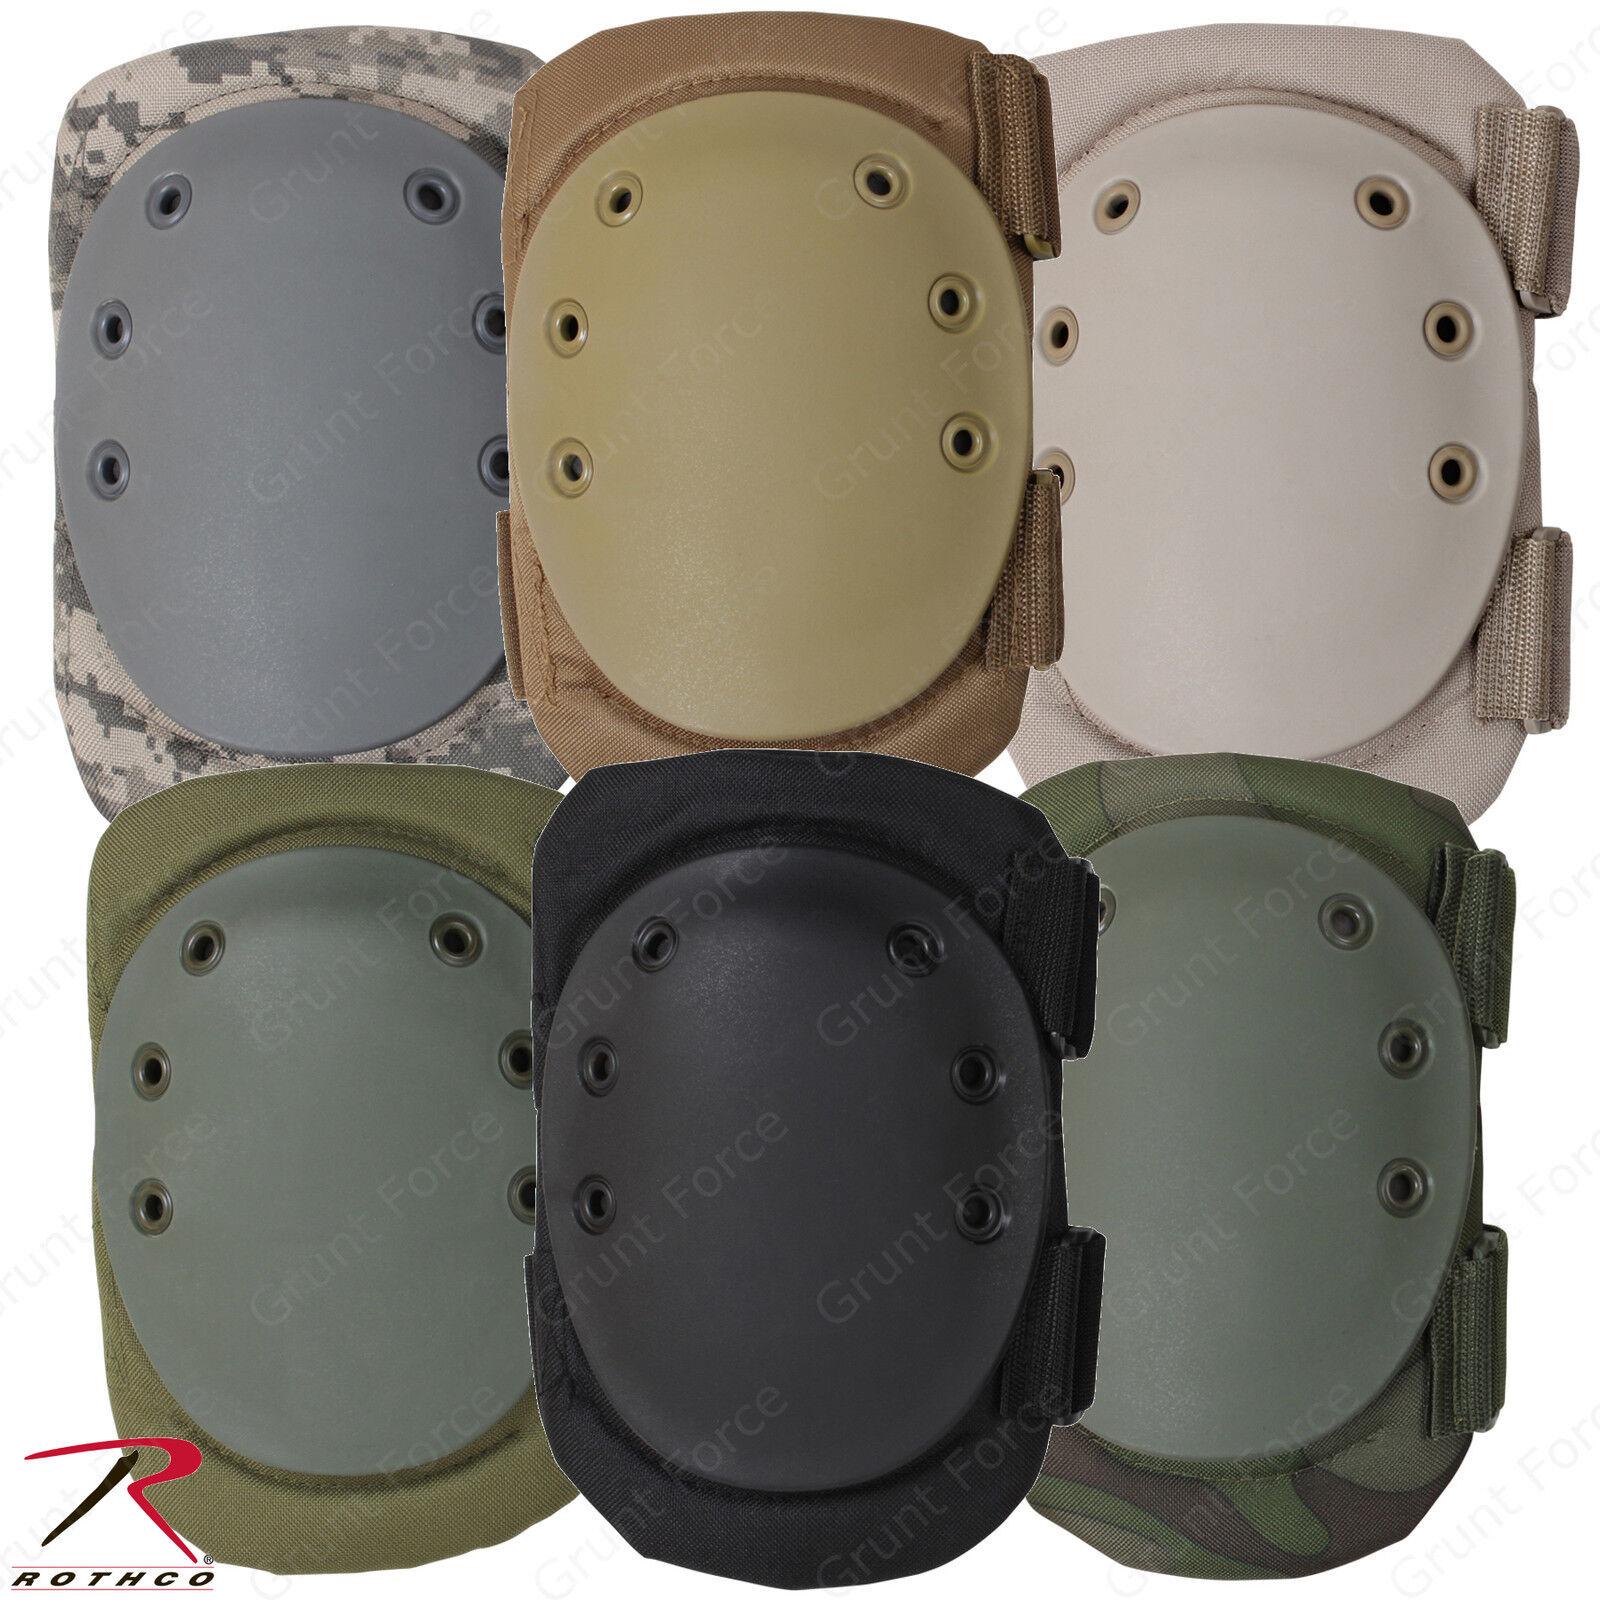 KNEE PADS survival tactical gear Rothco disaster emergency 11058 ACU digital